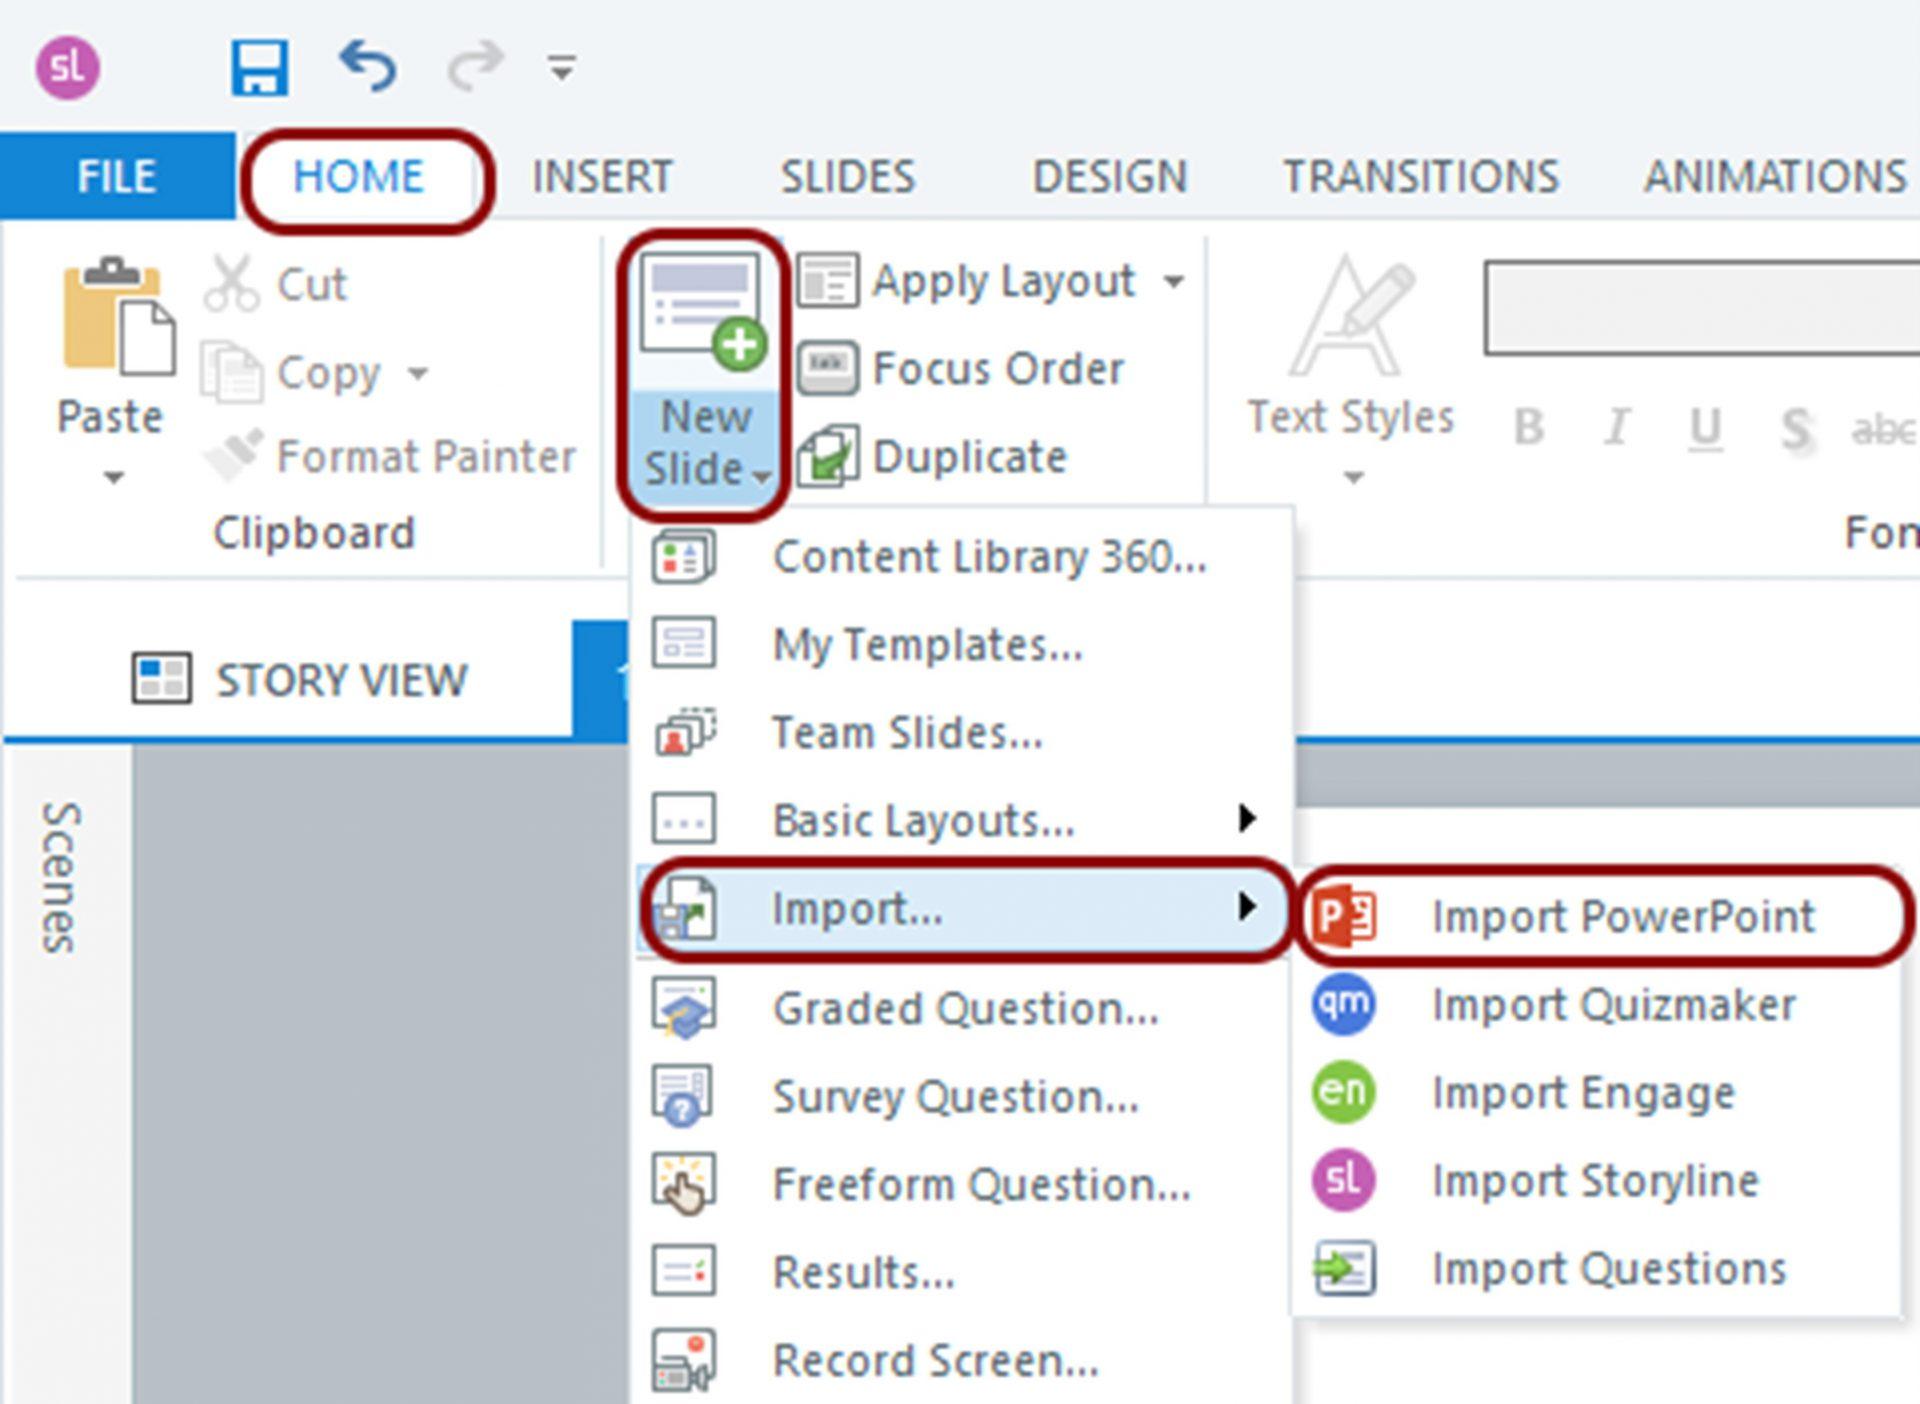 Import PowerPoint - Storyline